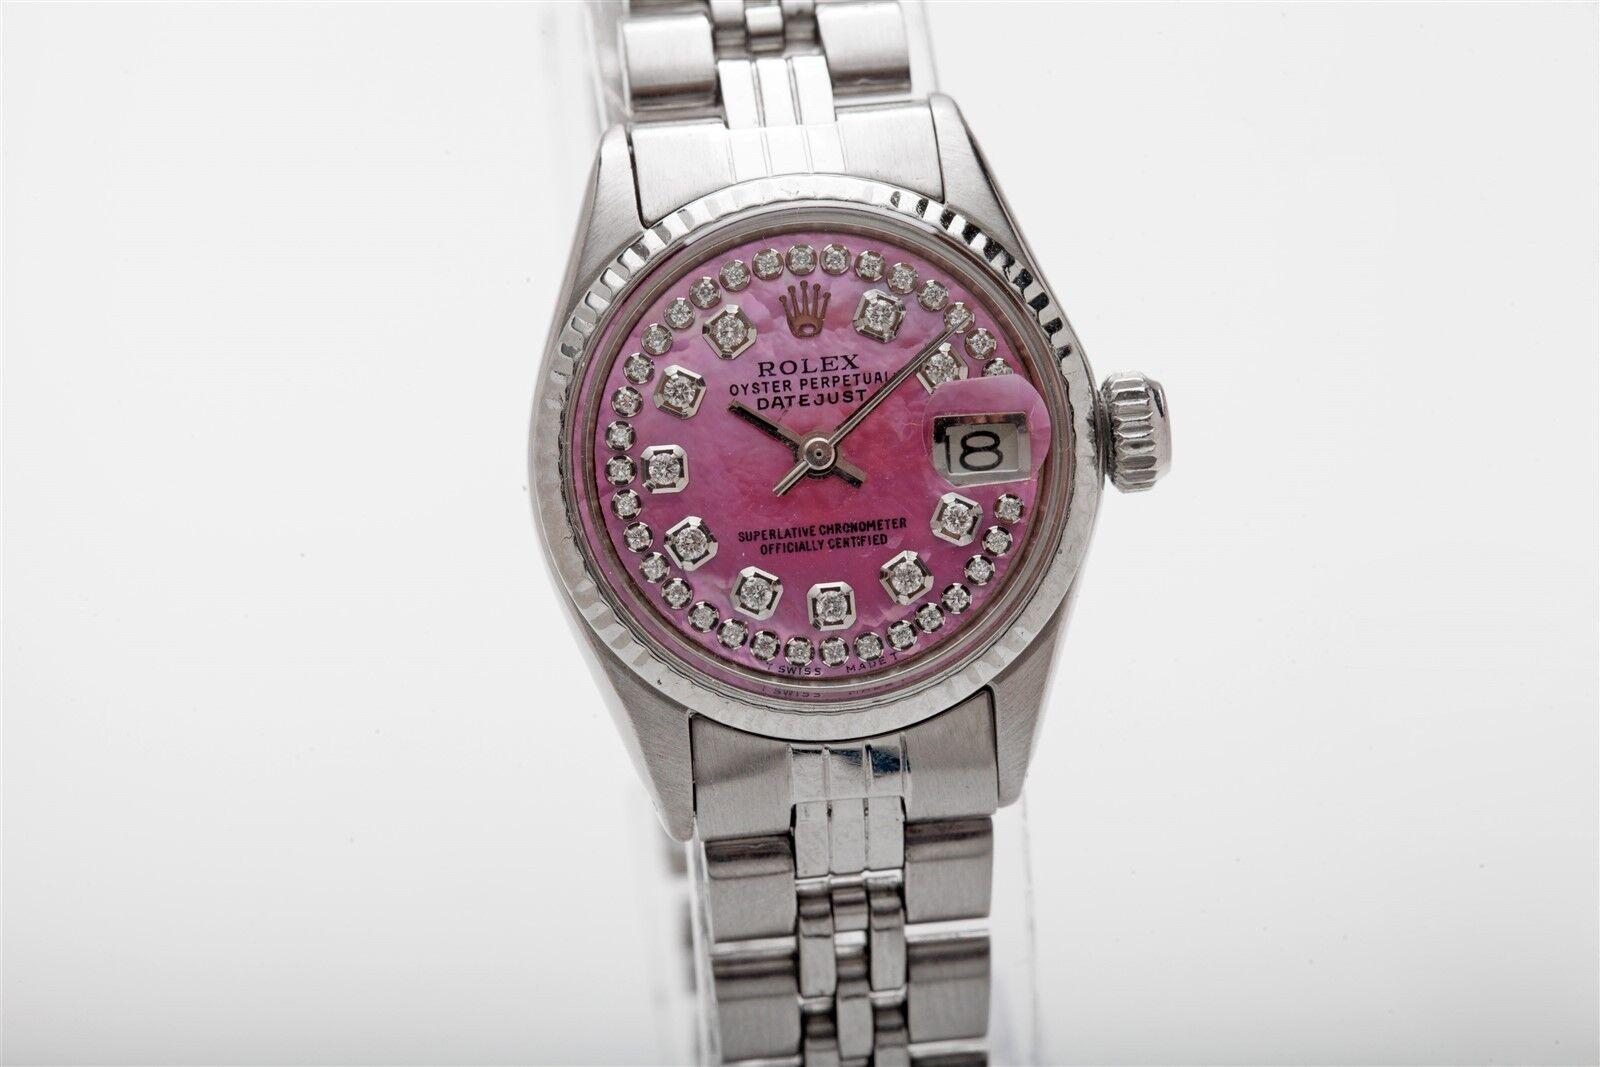 $2150.00 - $7000 PINK MOP Diamond SS 18k White Gold Genuine ROLEX Datejust Watch & BOX WTY